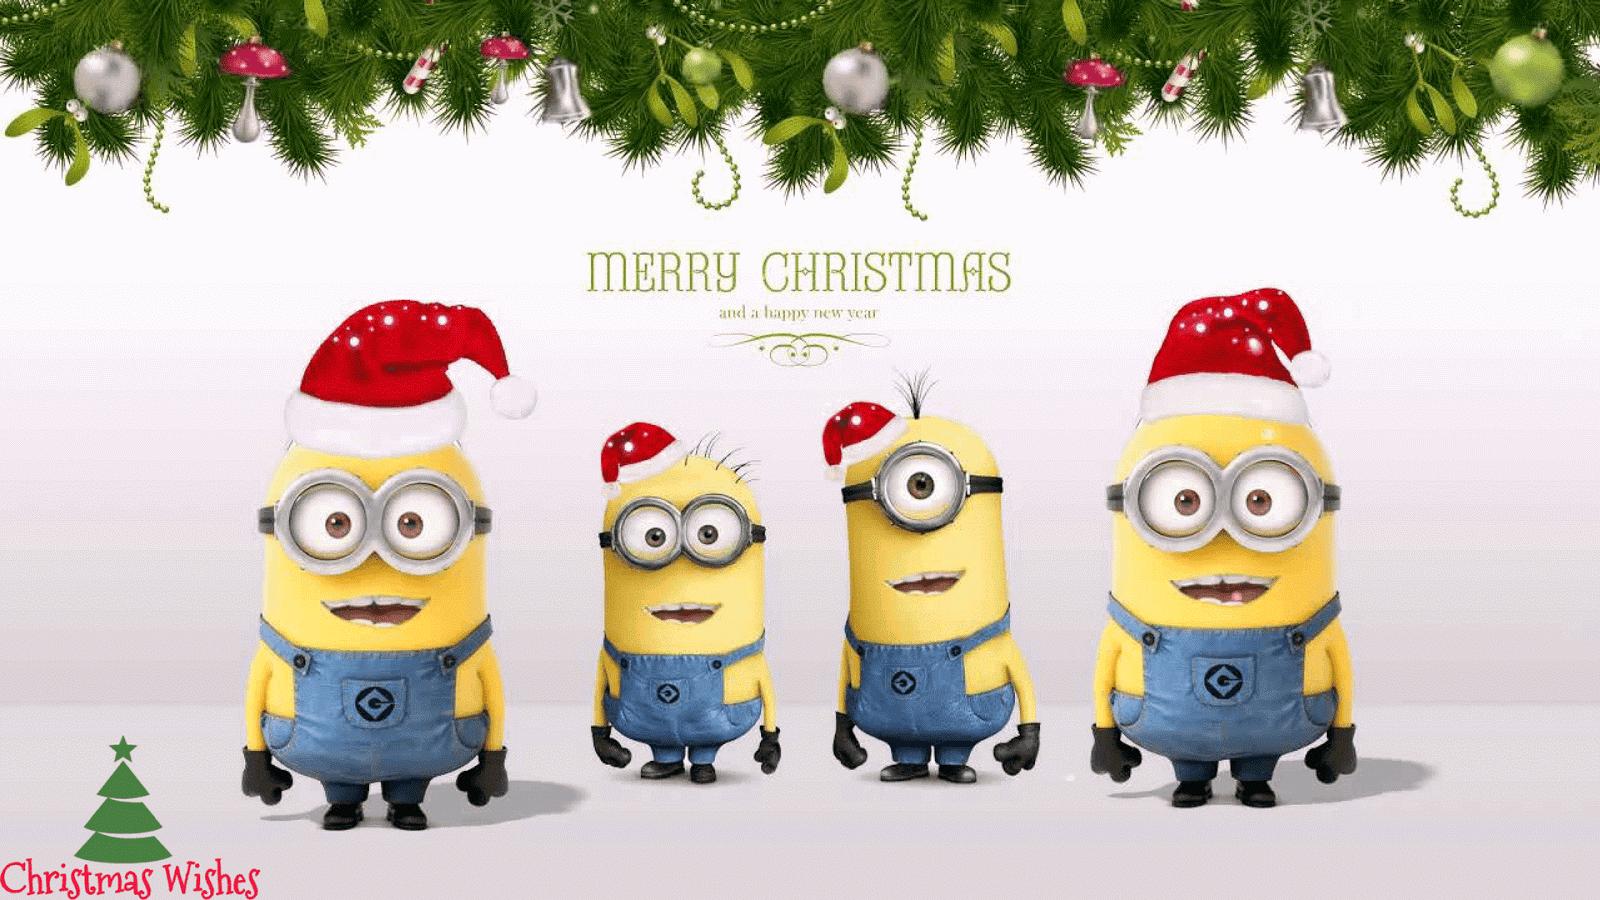 minions christmasminions christmas wallpaper merry christmas minions